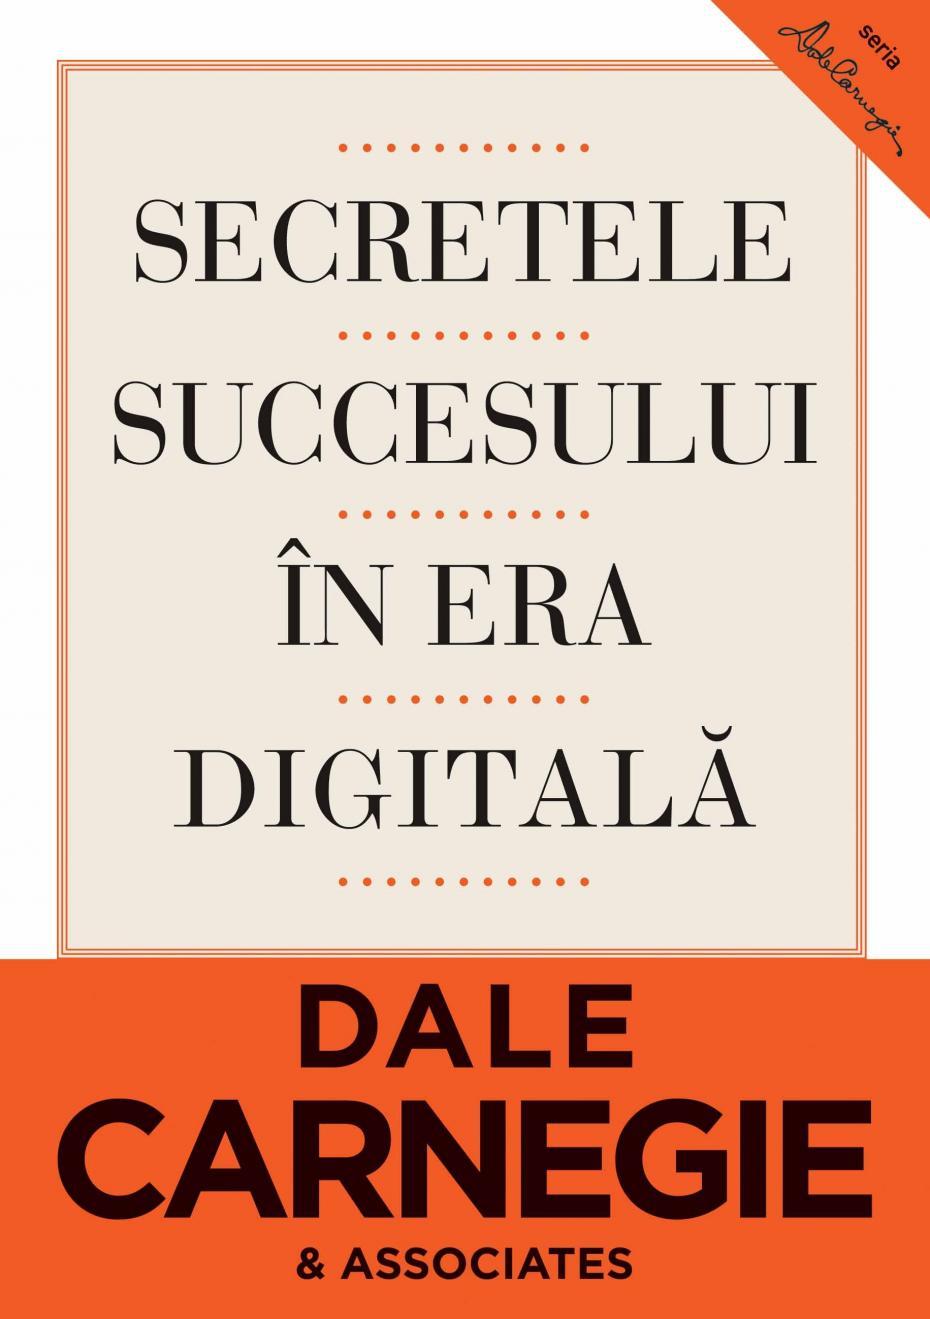 secretele-succesului-in-era-digitala-cum-sa-va-faceti-prieteni-si-sa-deveniti-influent_1_fullsize